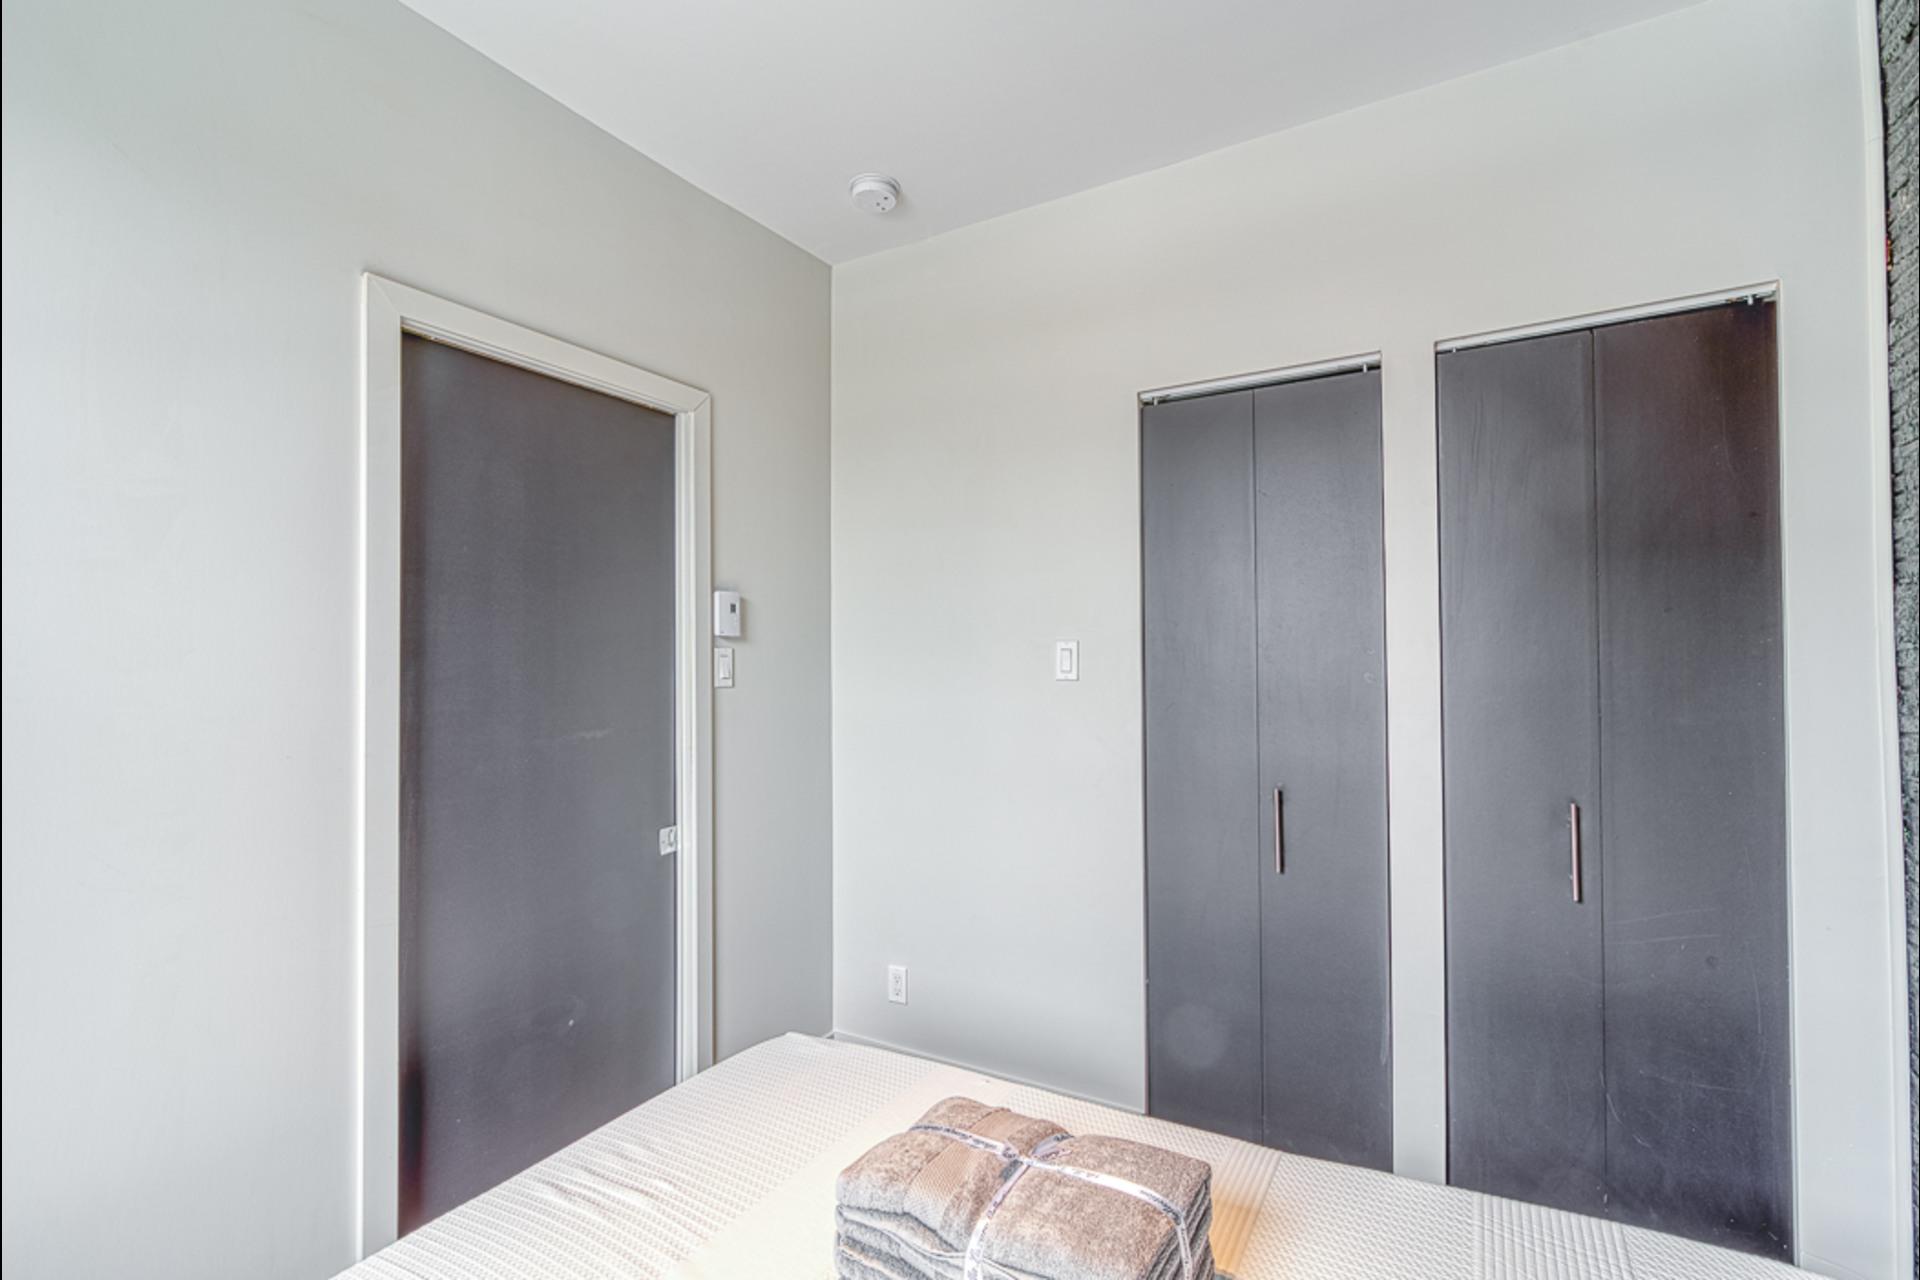 image 5 - Furnished Appartement For rent Montréal - 3 rooms